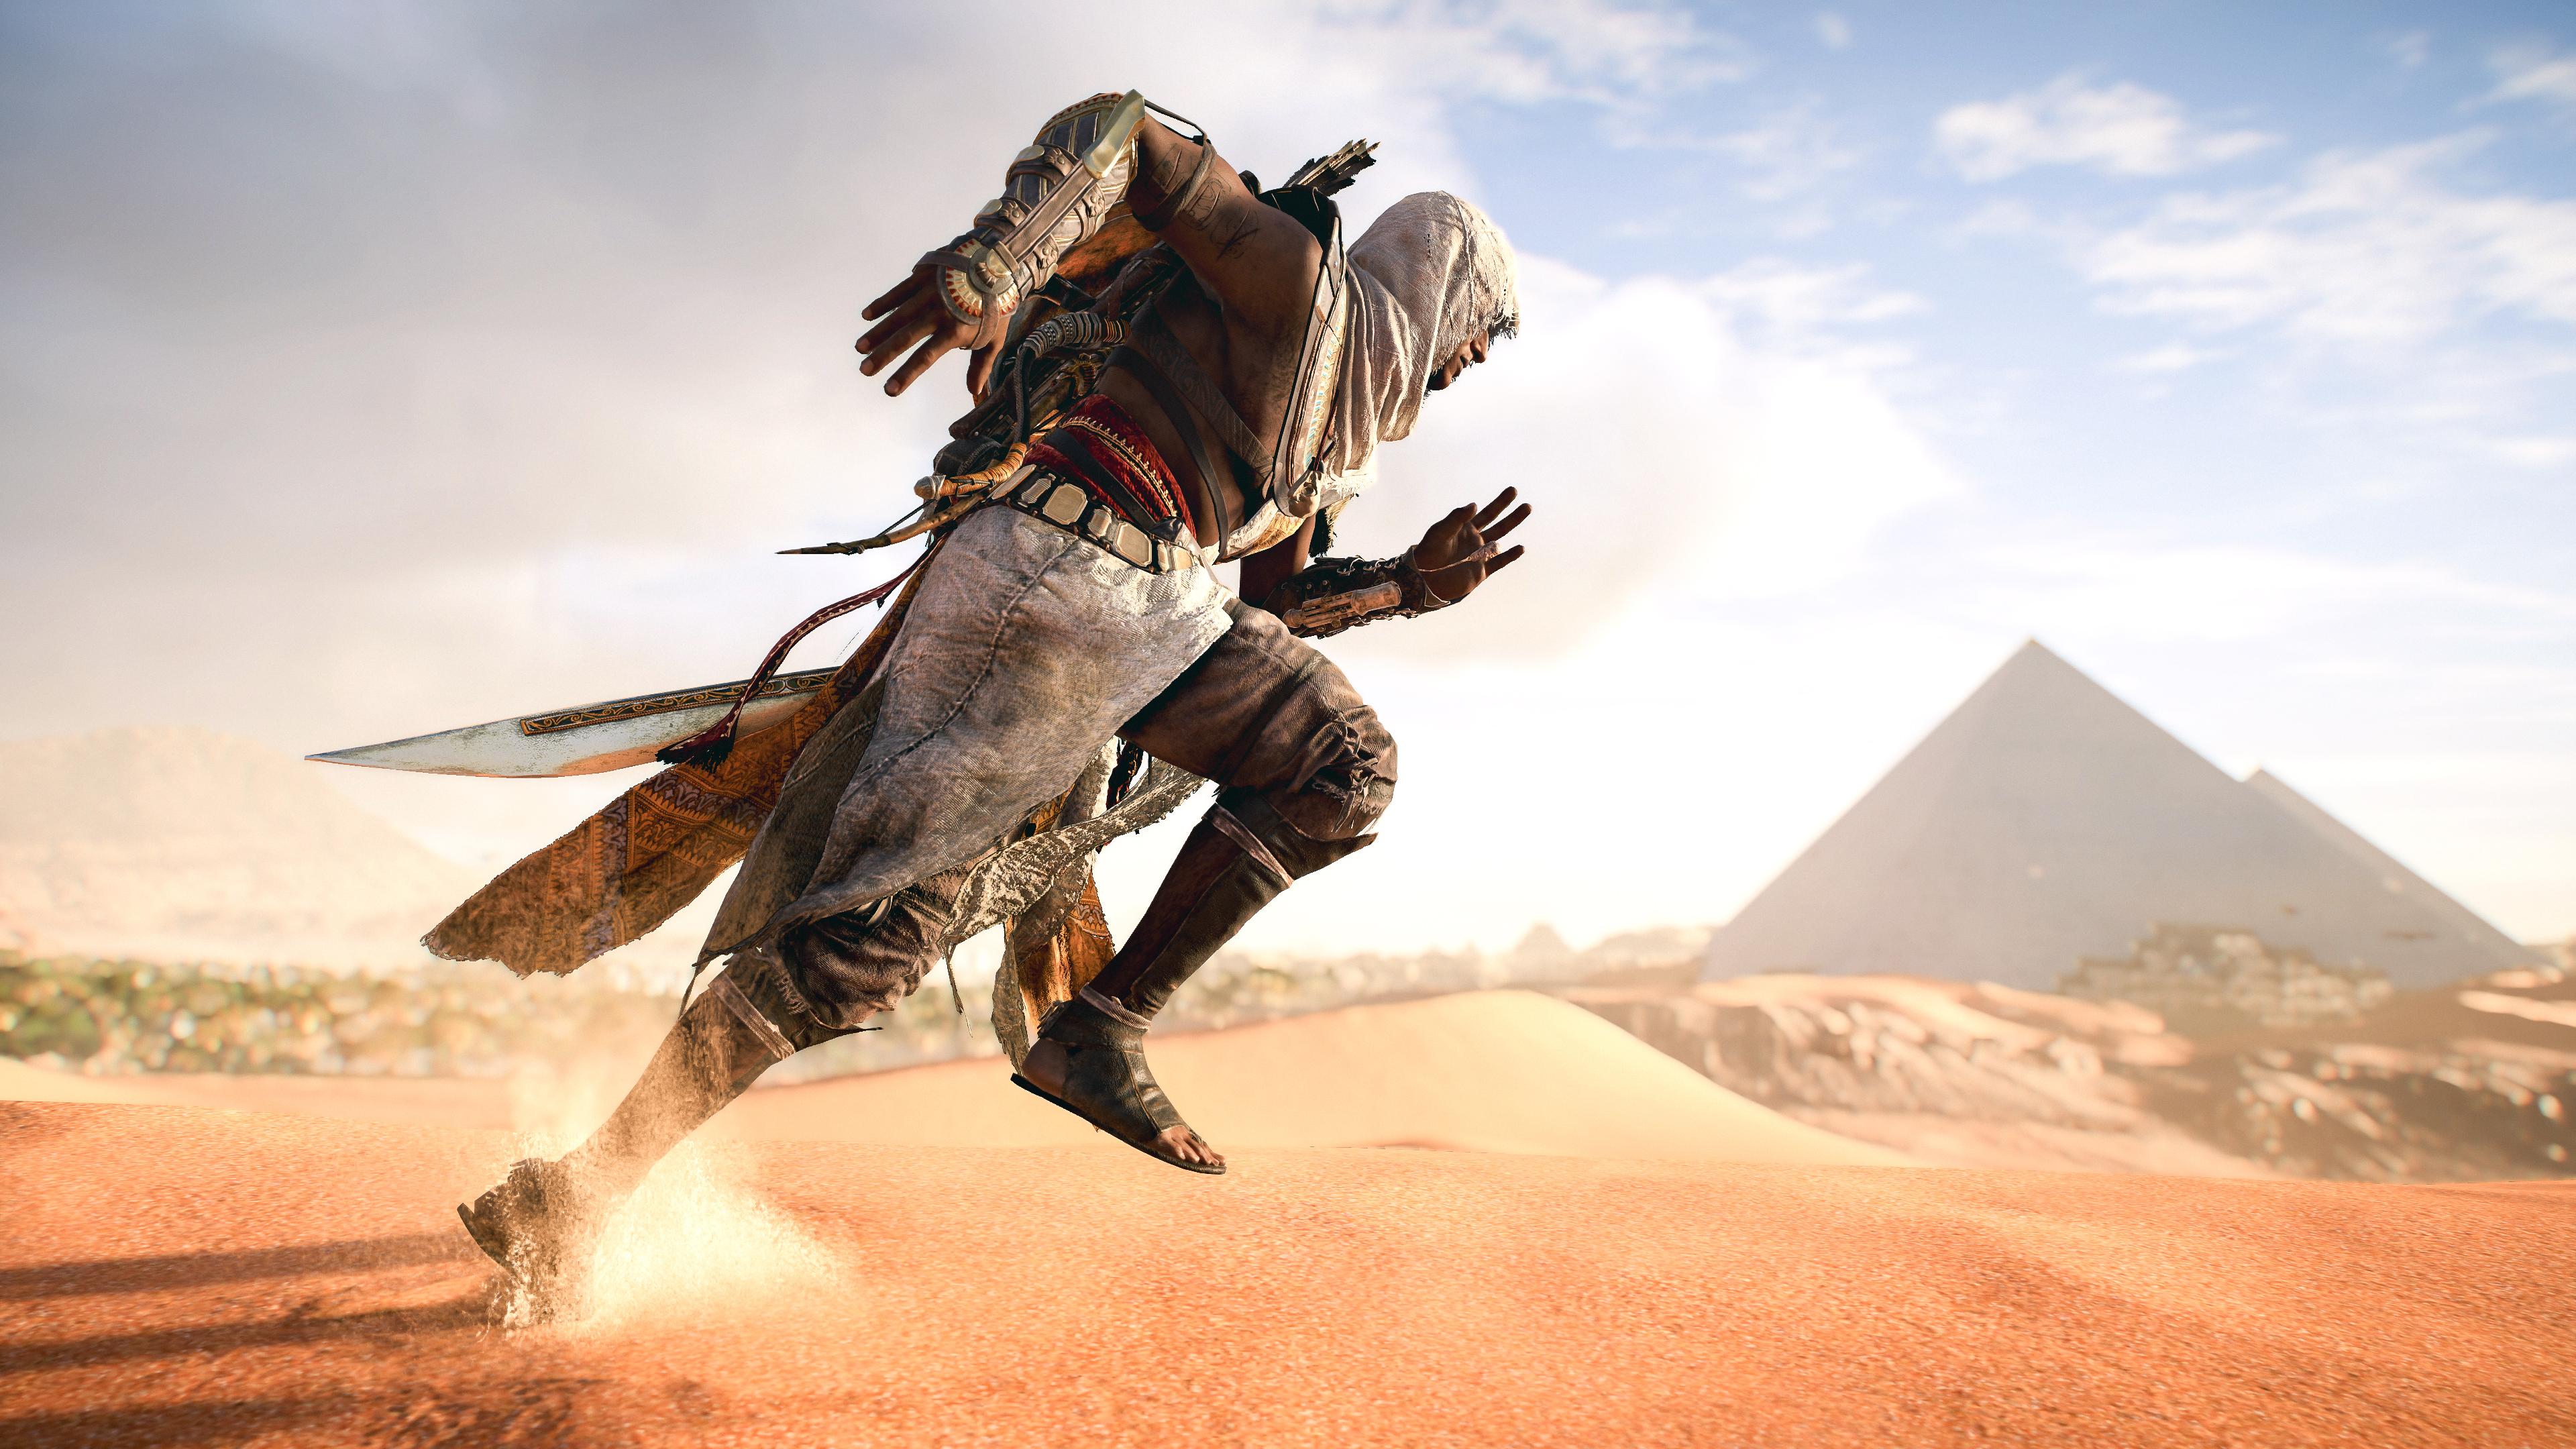 2560x1440 Pubg Weapons Helmet Girl 4k 1440p Resolution Hd: Assassins Creed Origins 4k 2018 Xbox Games Wallpapers, Ps